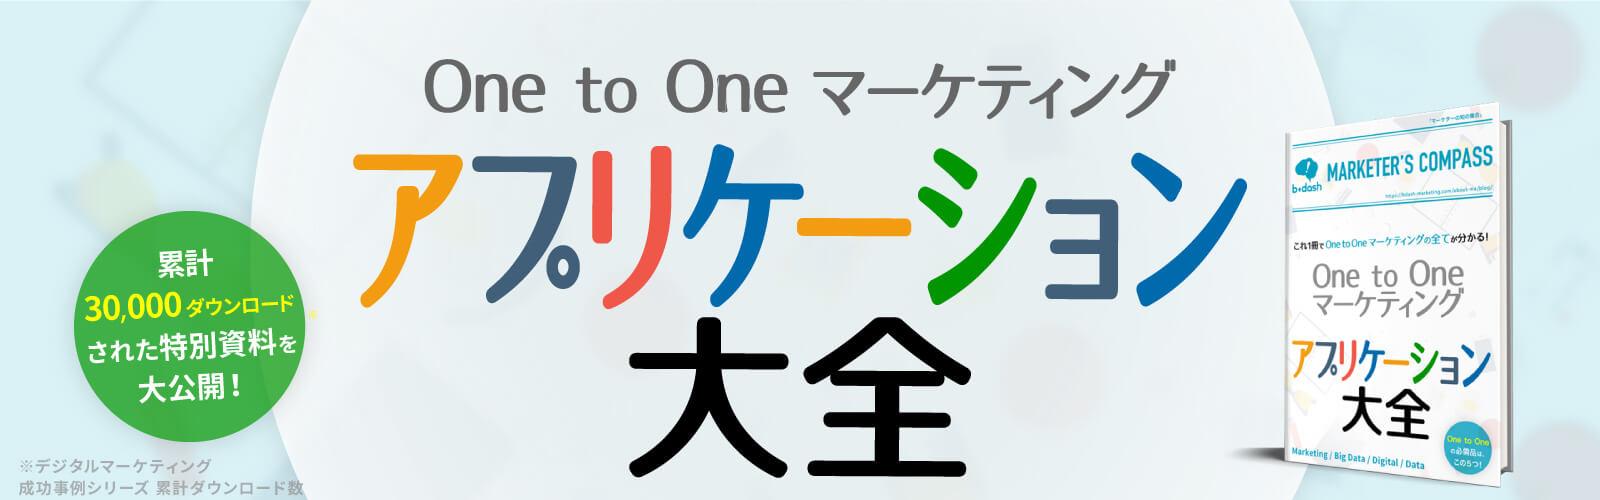 One to Oneマーケティング アプリケーション大全